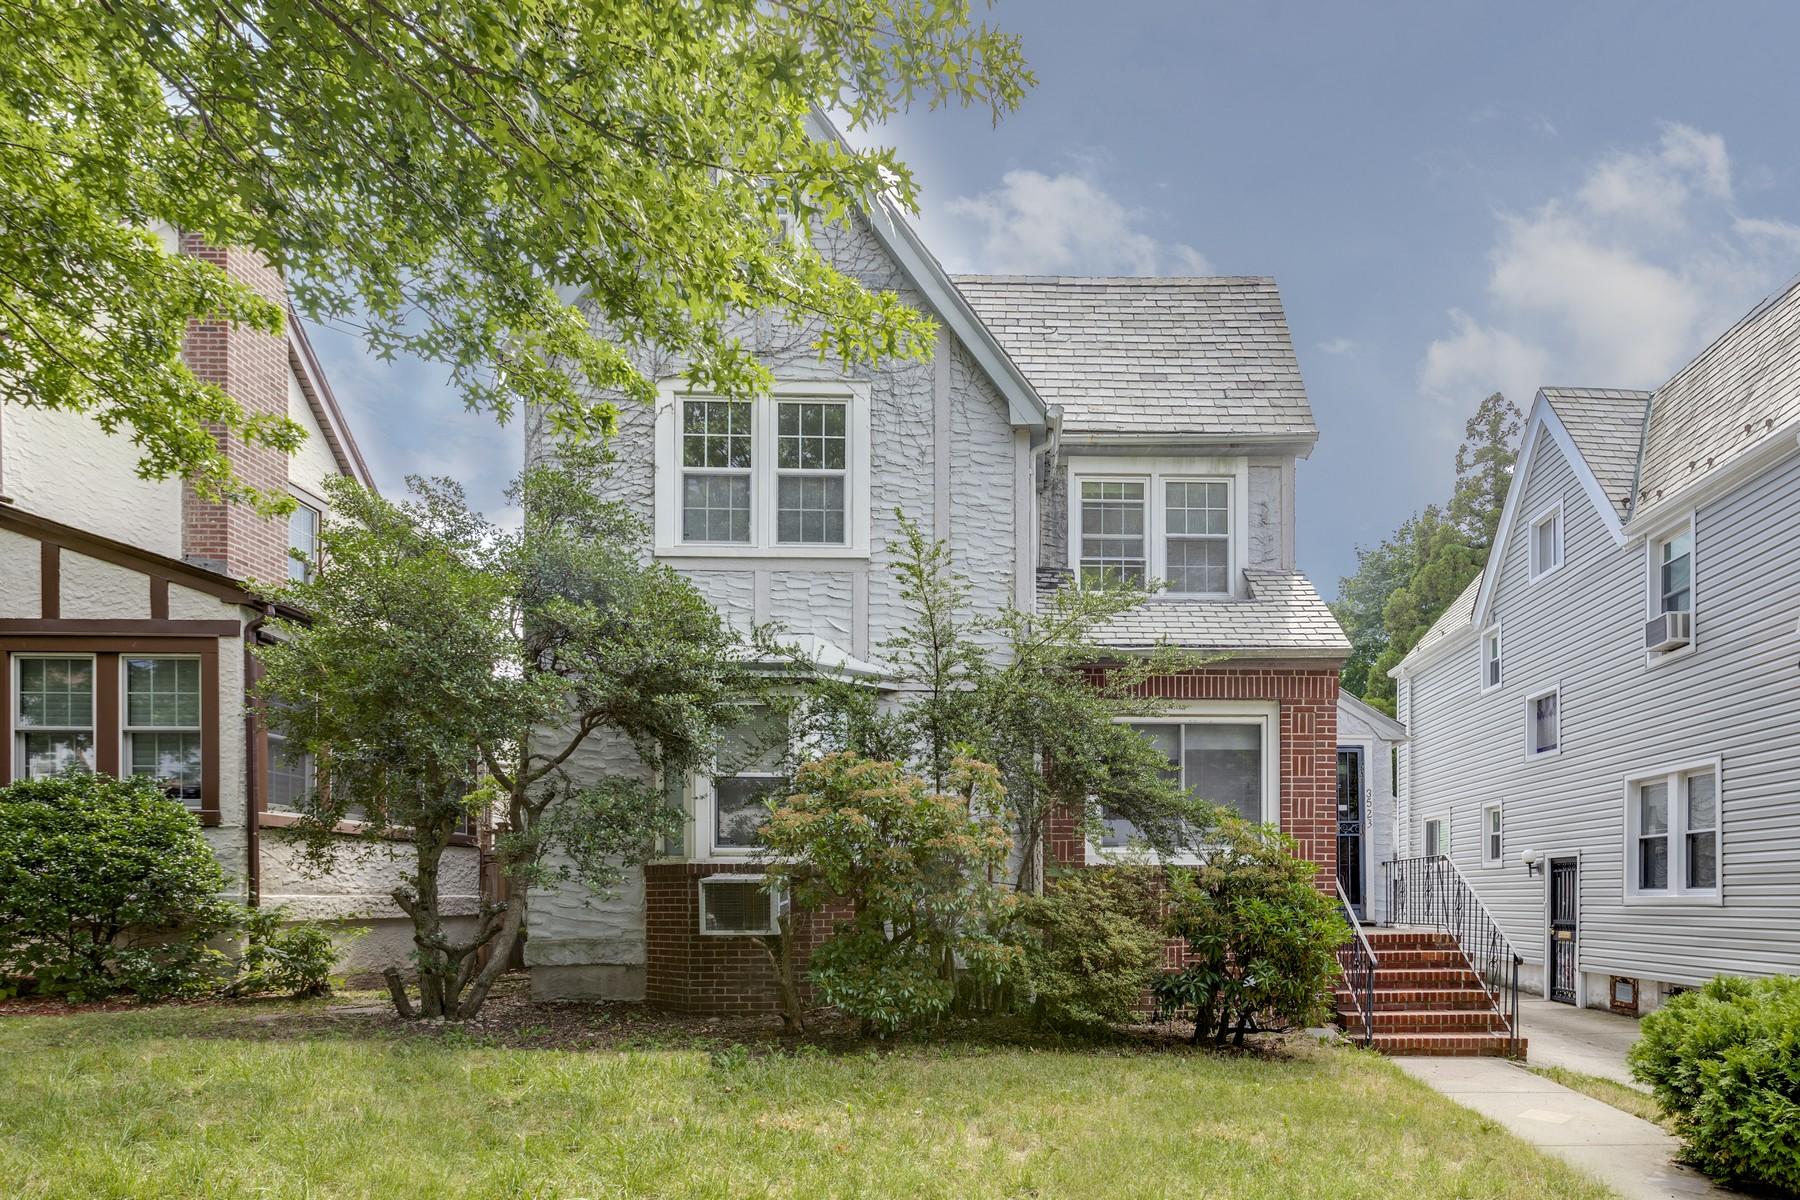 Single Family Homes for Active at Flushing 3523 171st St Flushing, New York 11358 United States